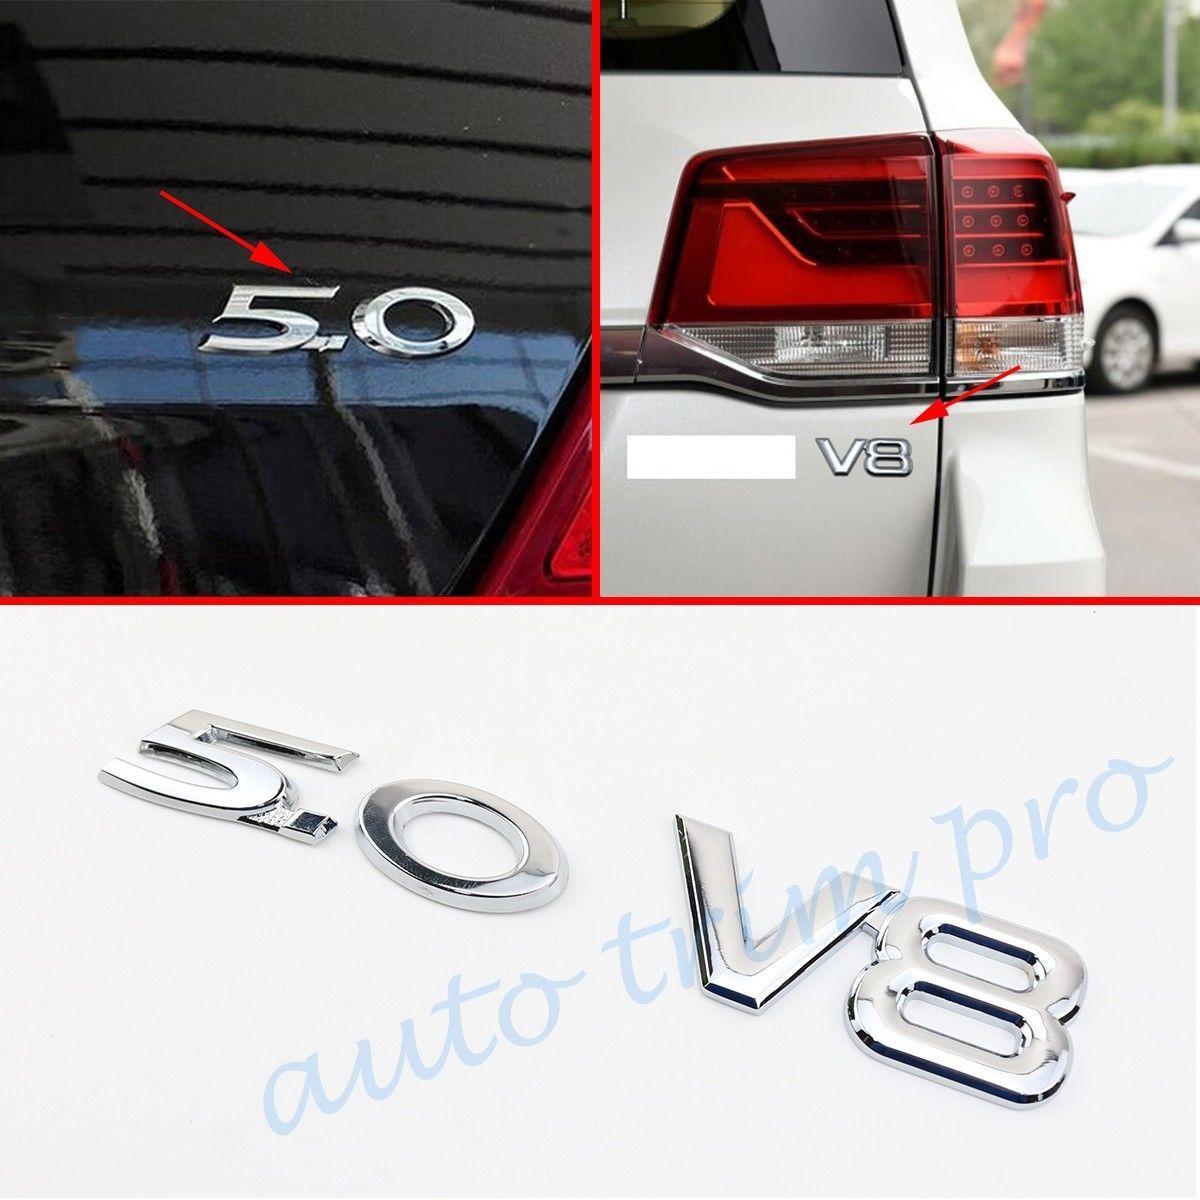 Pair Metal Car Motor Engine Turbo Trim Badge Chrome 5.0+V8 Emblem Logo 3D Decal Sticker Decorate